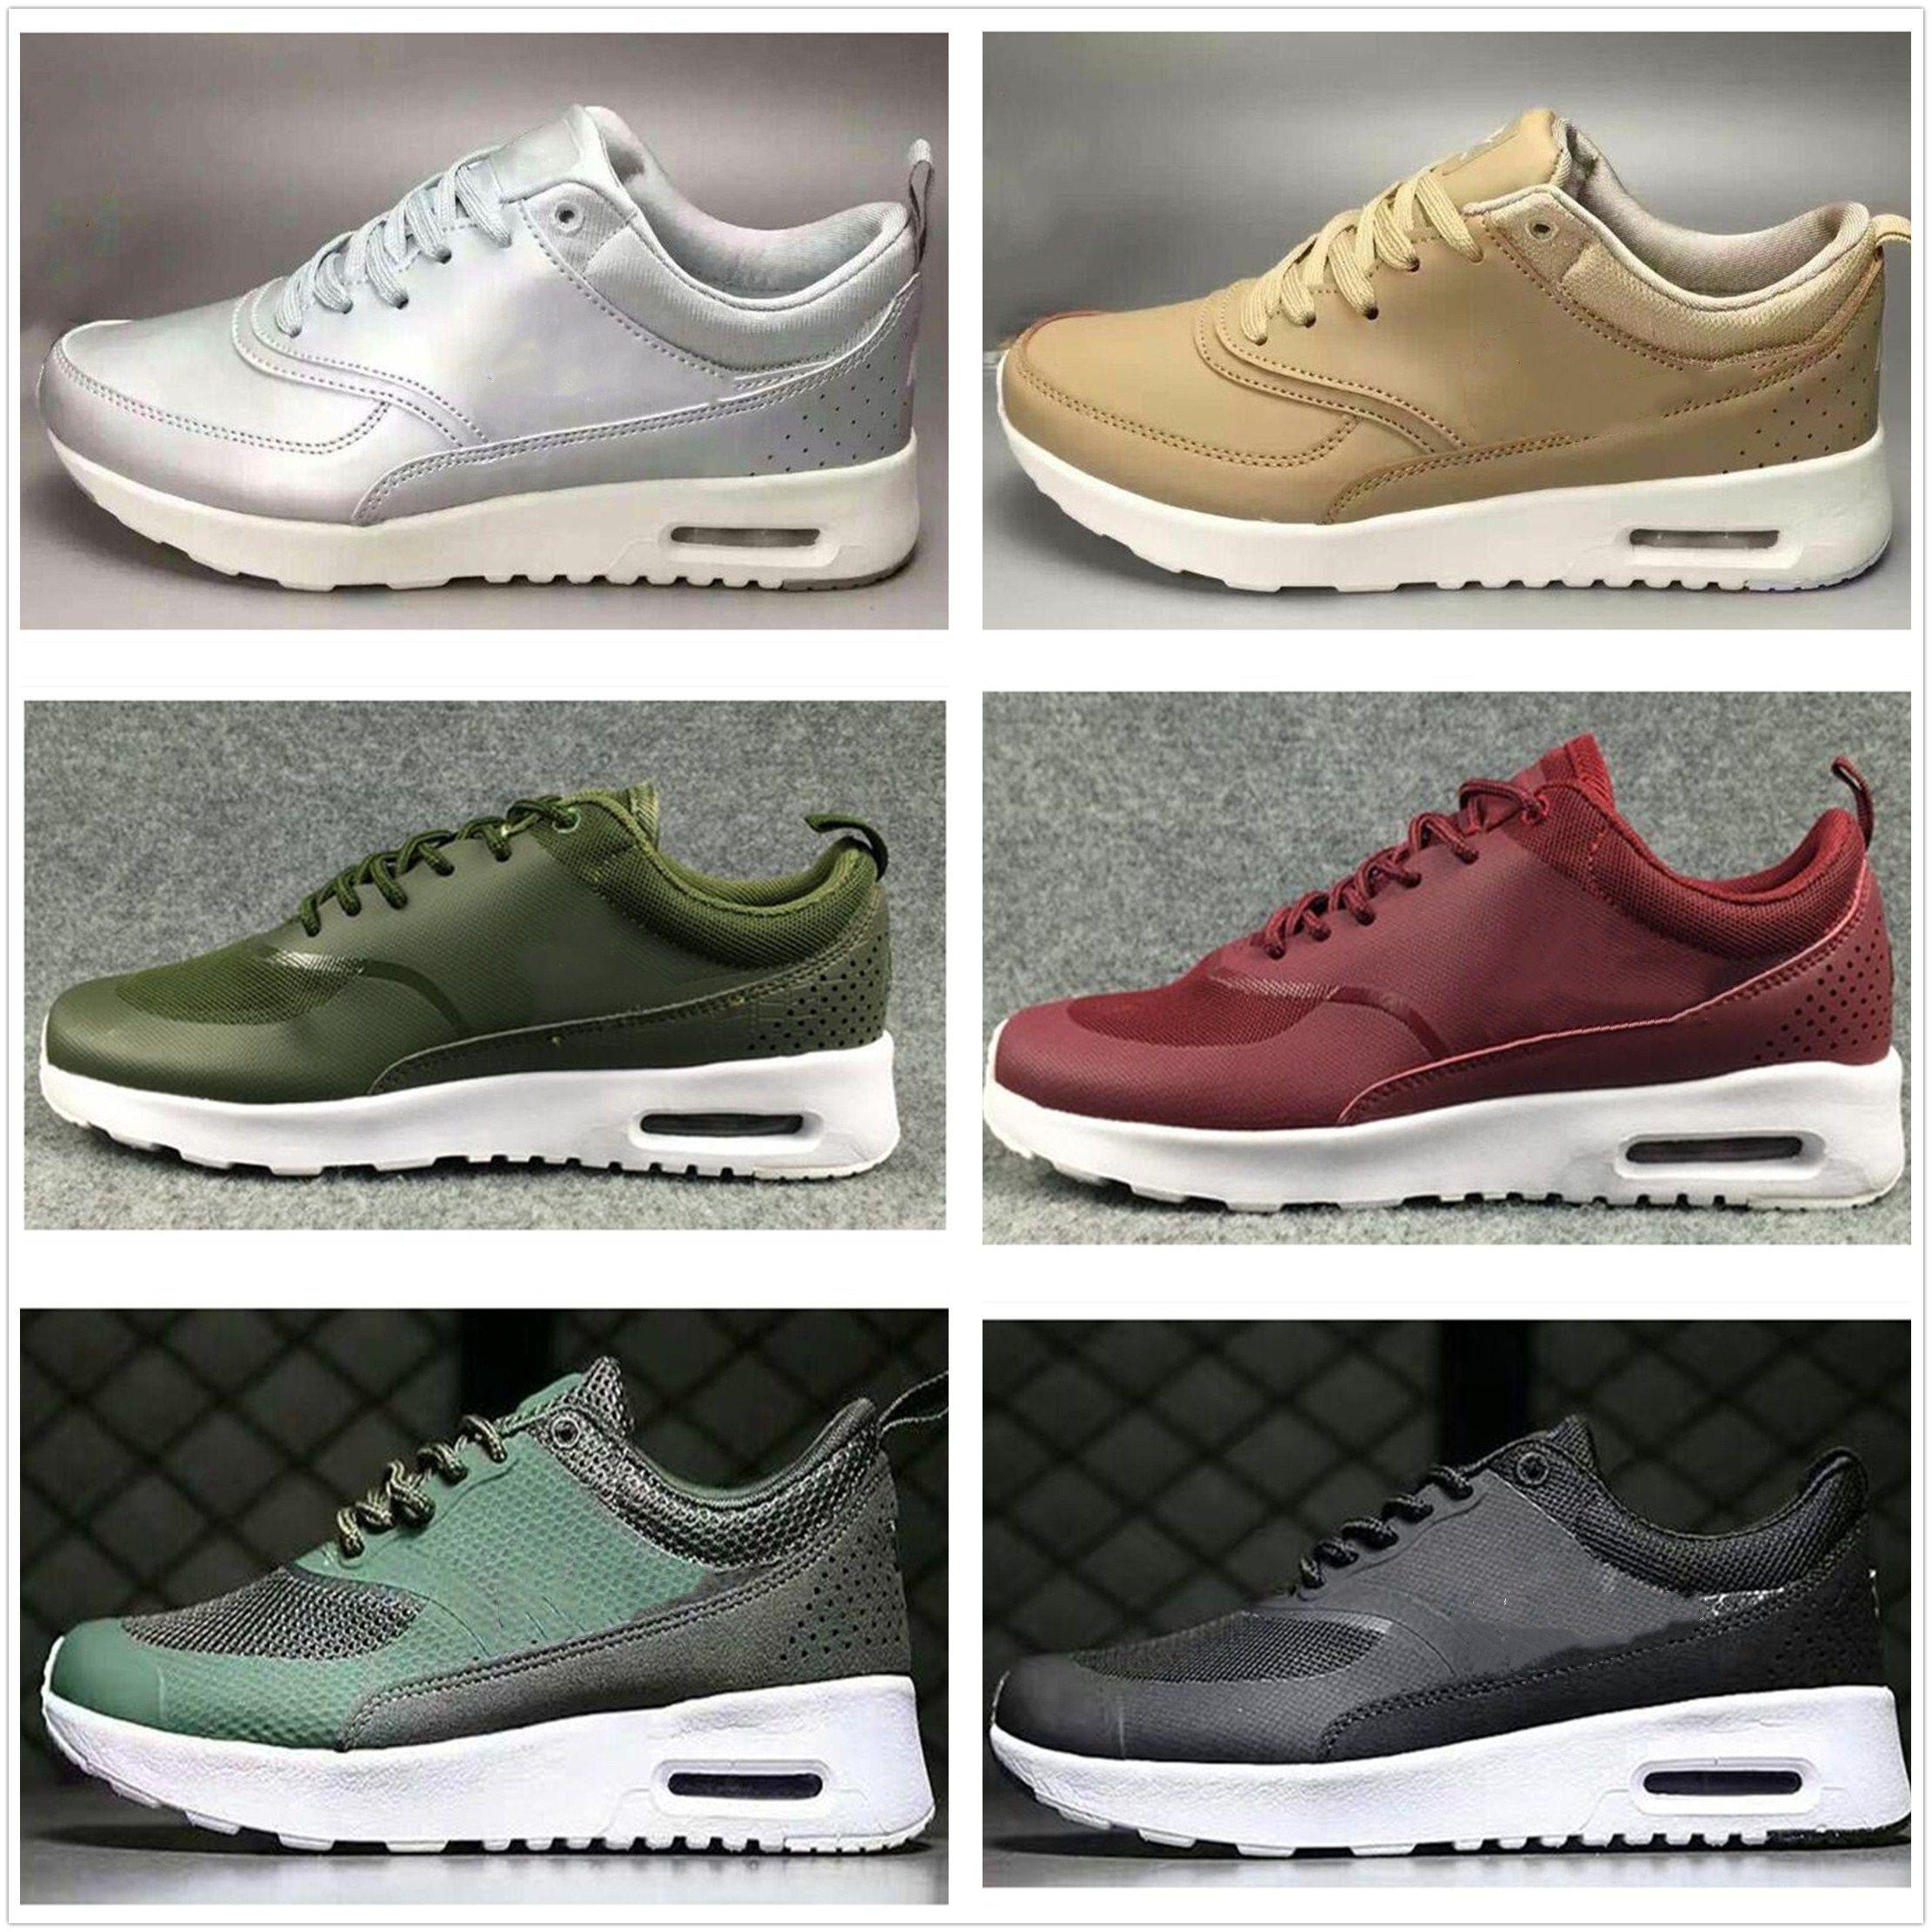 best service 9a3a1 464b0 Compre Nike Air Max Airmax 87 Classic Men Women 87 Zapatillas De Deporte De  Diseño 2018 Zapatillas De Deporte Thea De Cuero Para Hombre Huaraches Tenis  ...